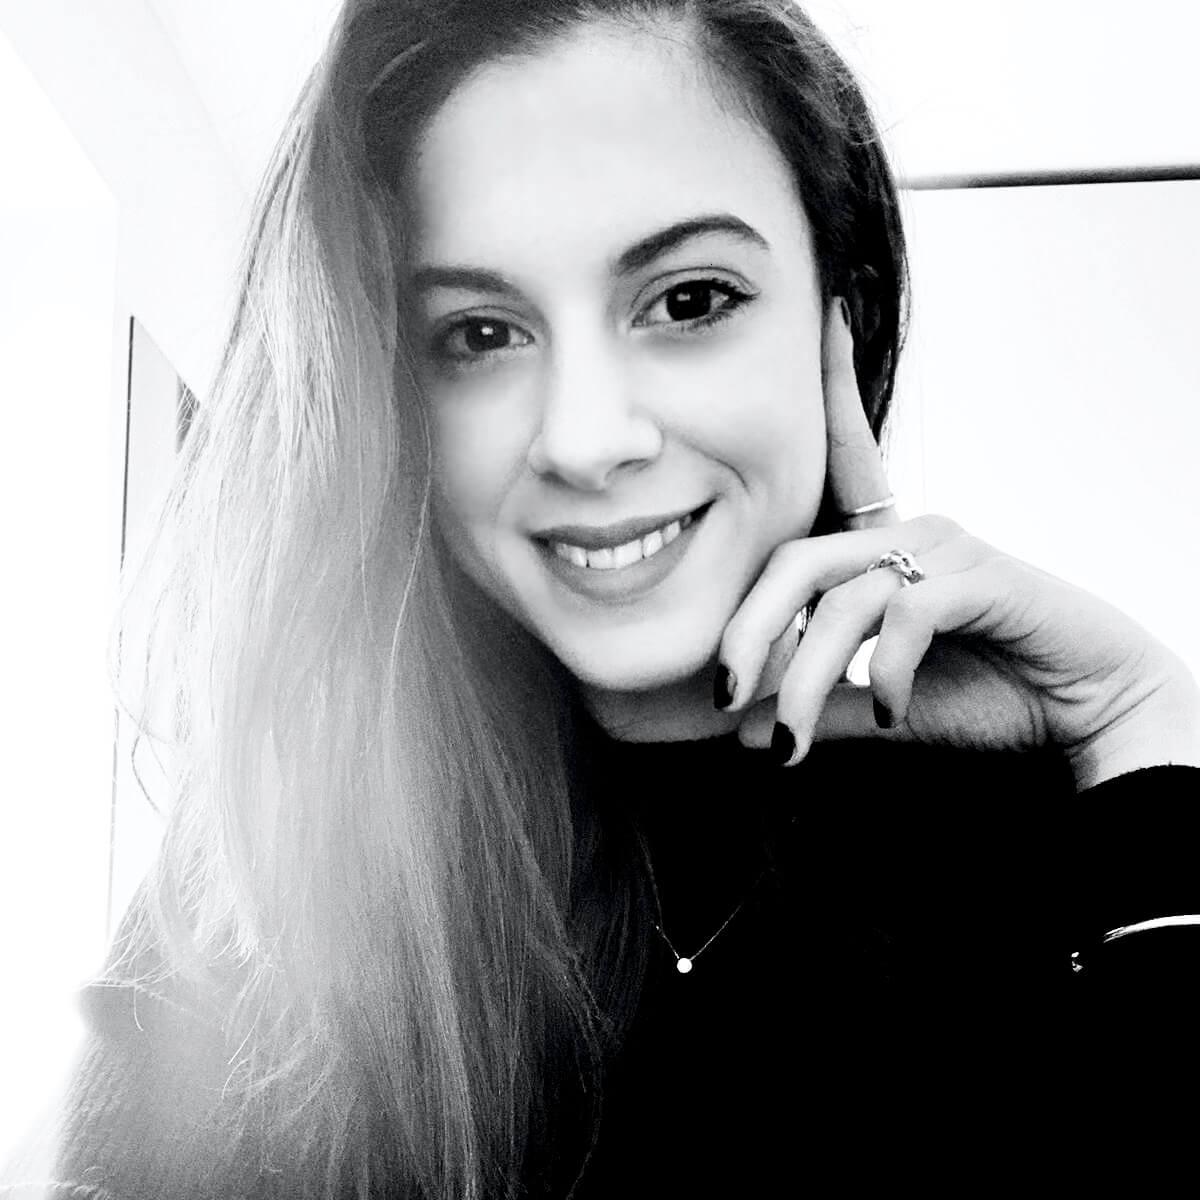 Beatrice Torreggiani LikeCompany